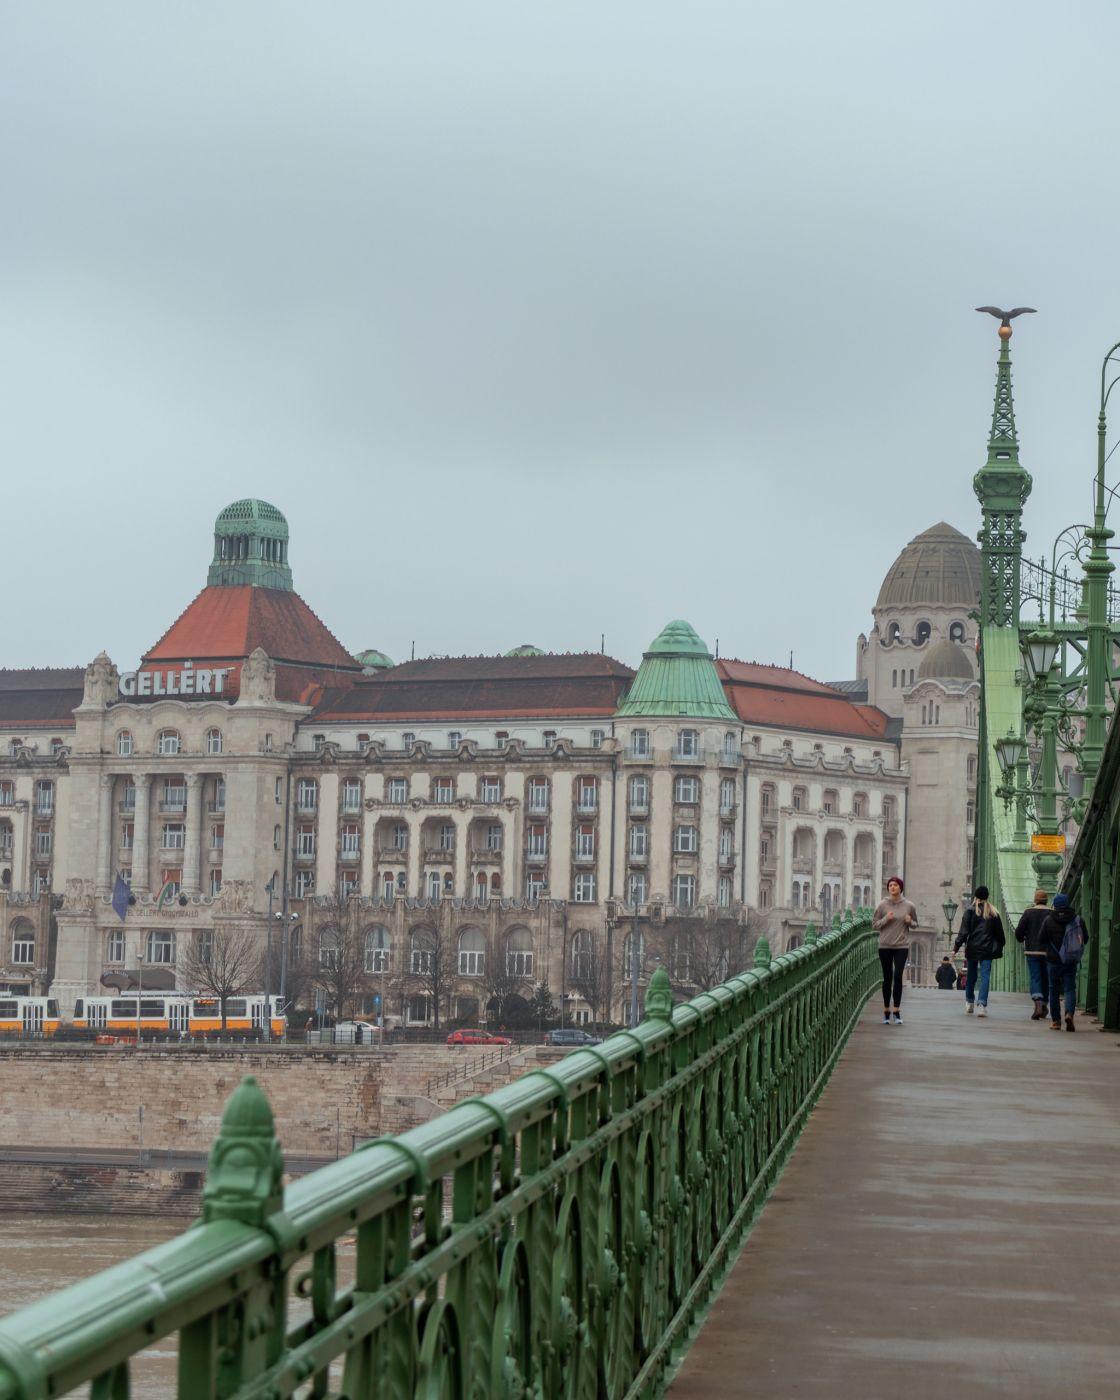 Liberty Bridge and Gellért Thermal Bath, Hungary